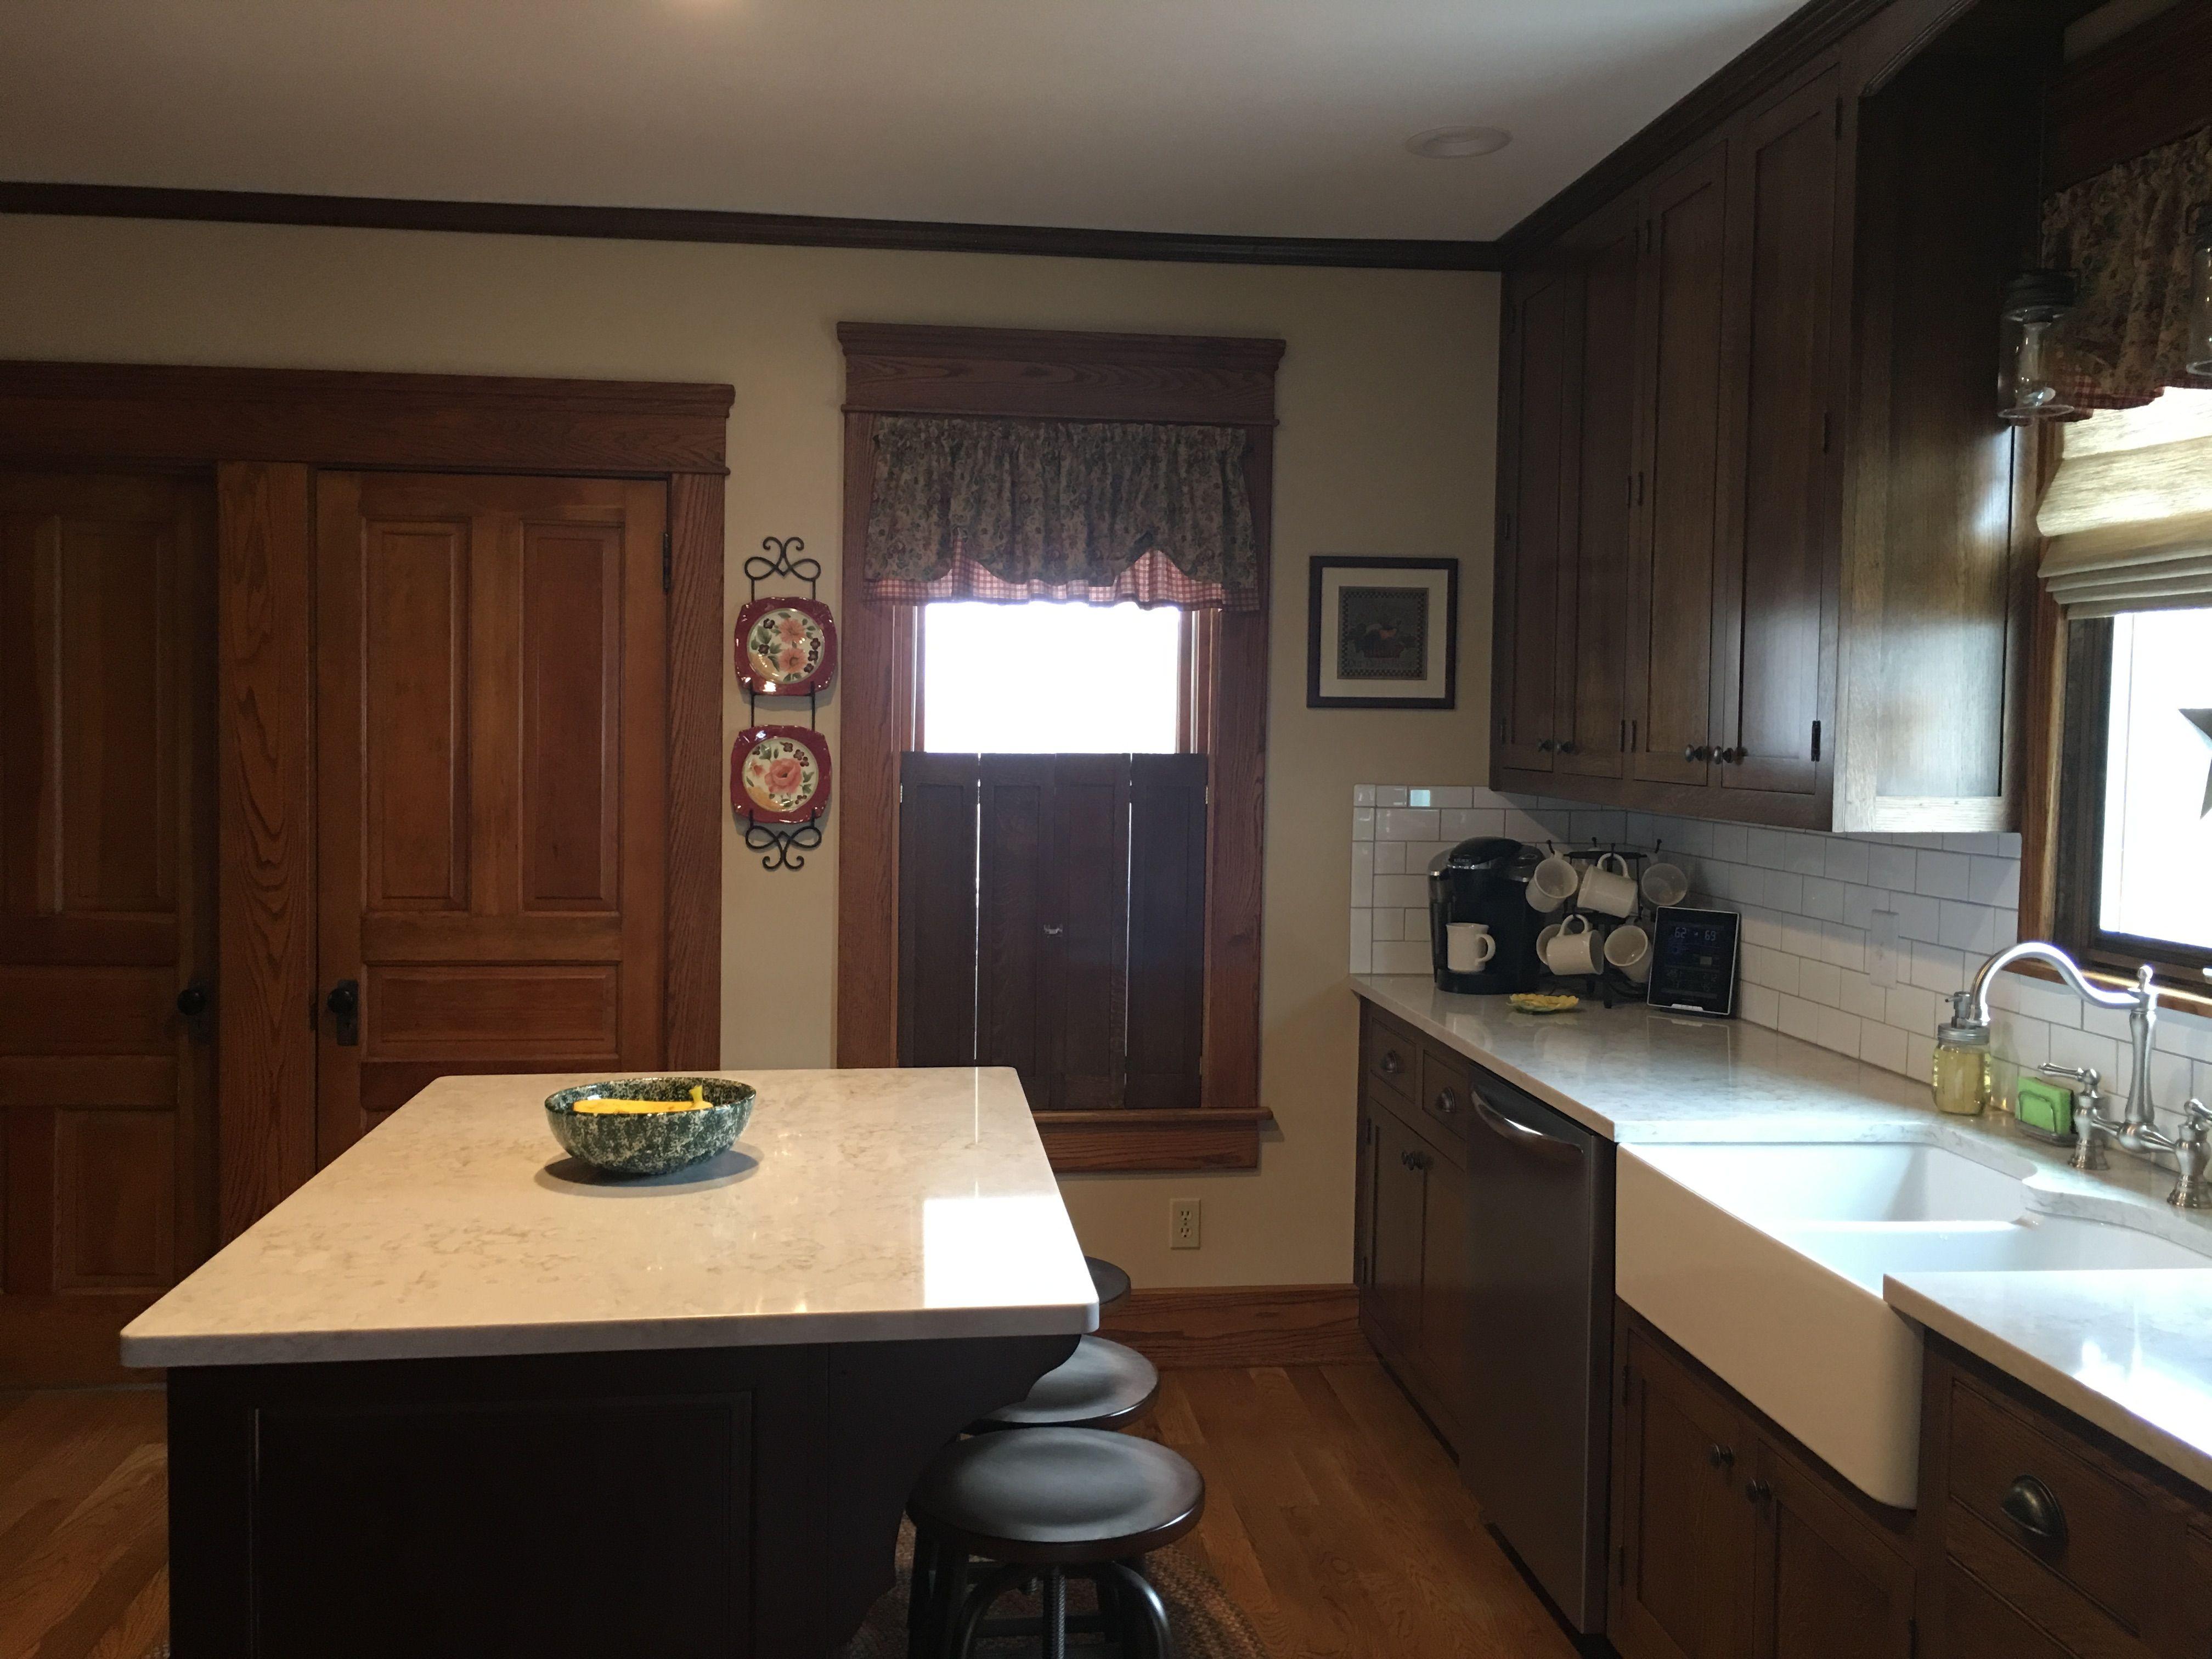 Panel quarter sawn white oak interior door craftsman interior doors - Cabinets Quarter Sawn White Oak With Minwax Espresso Stain Floor Is White Oak With Bona